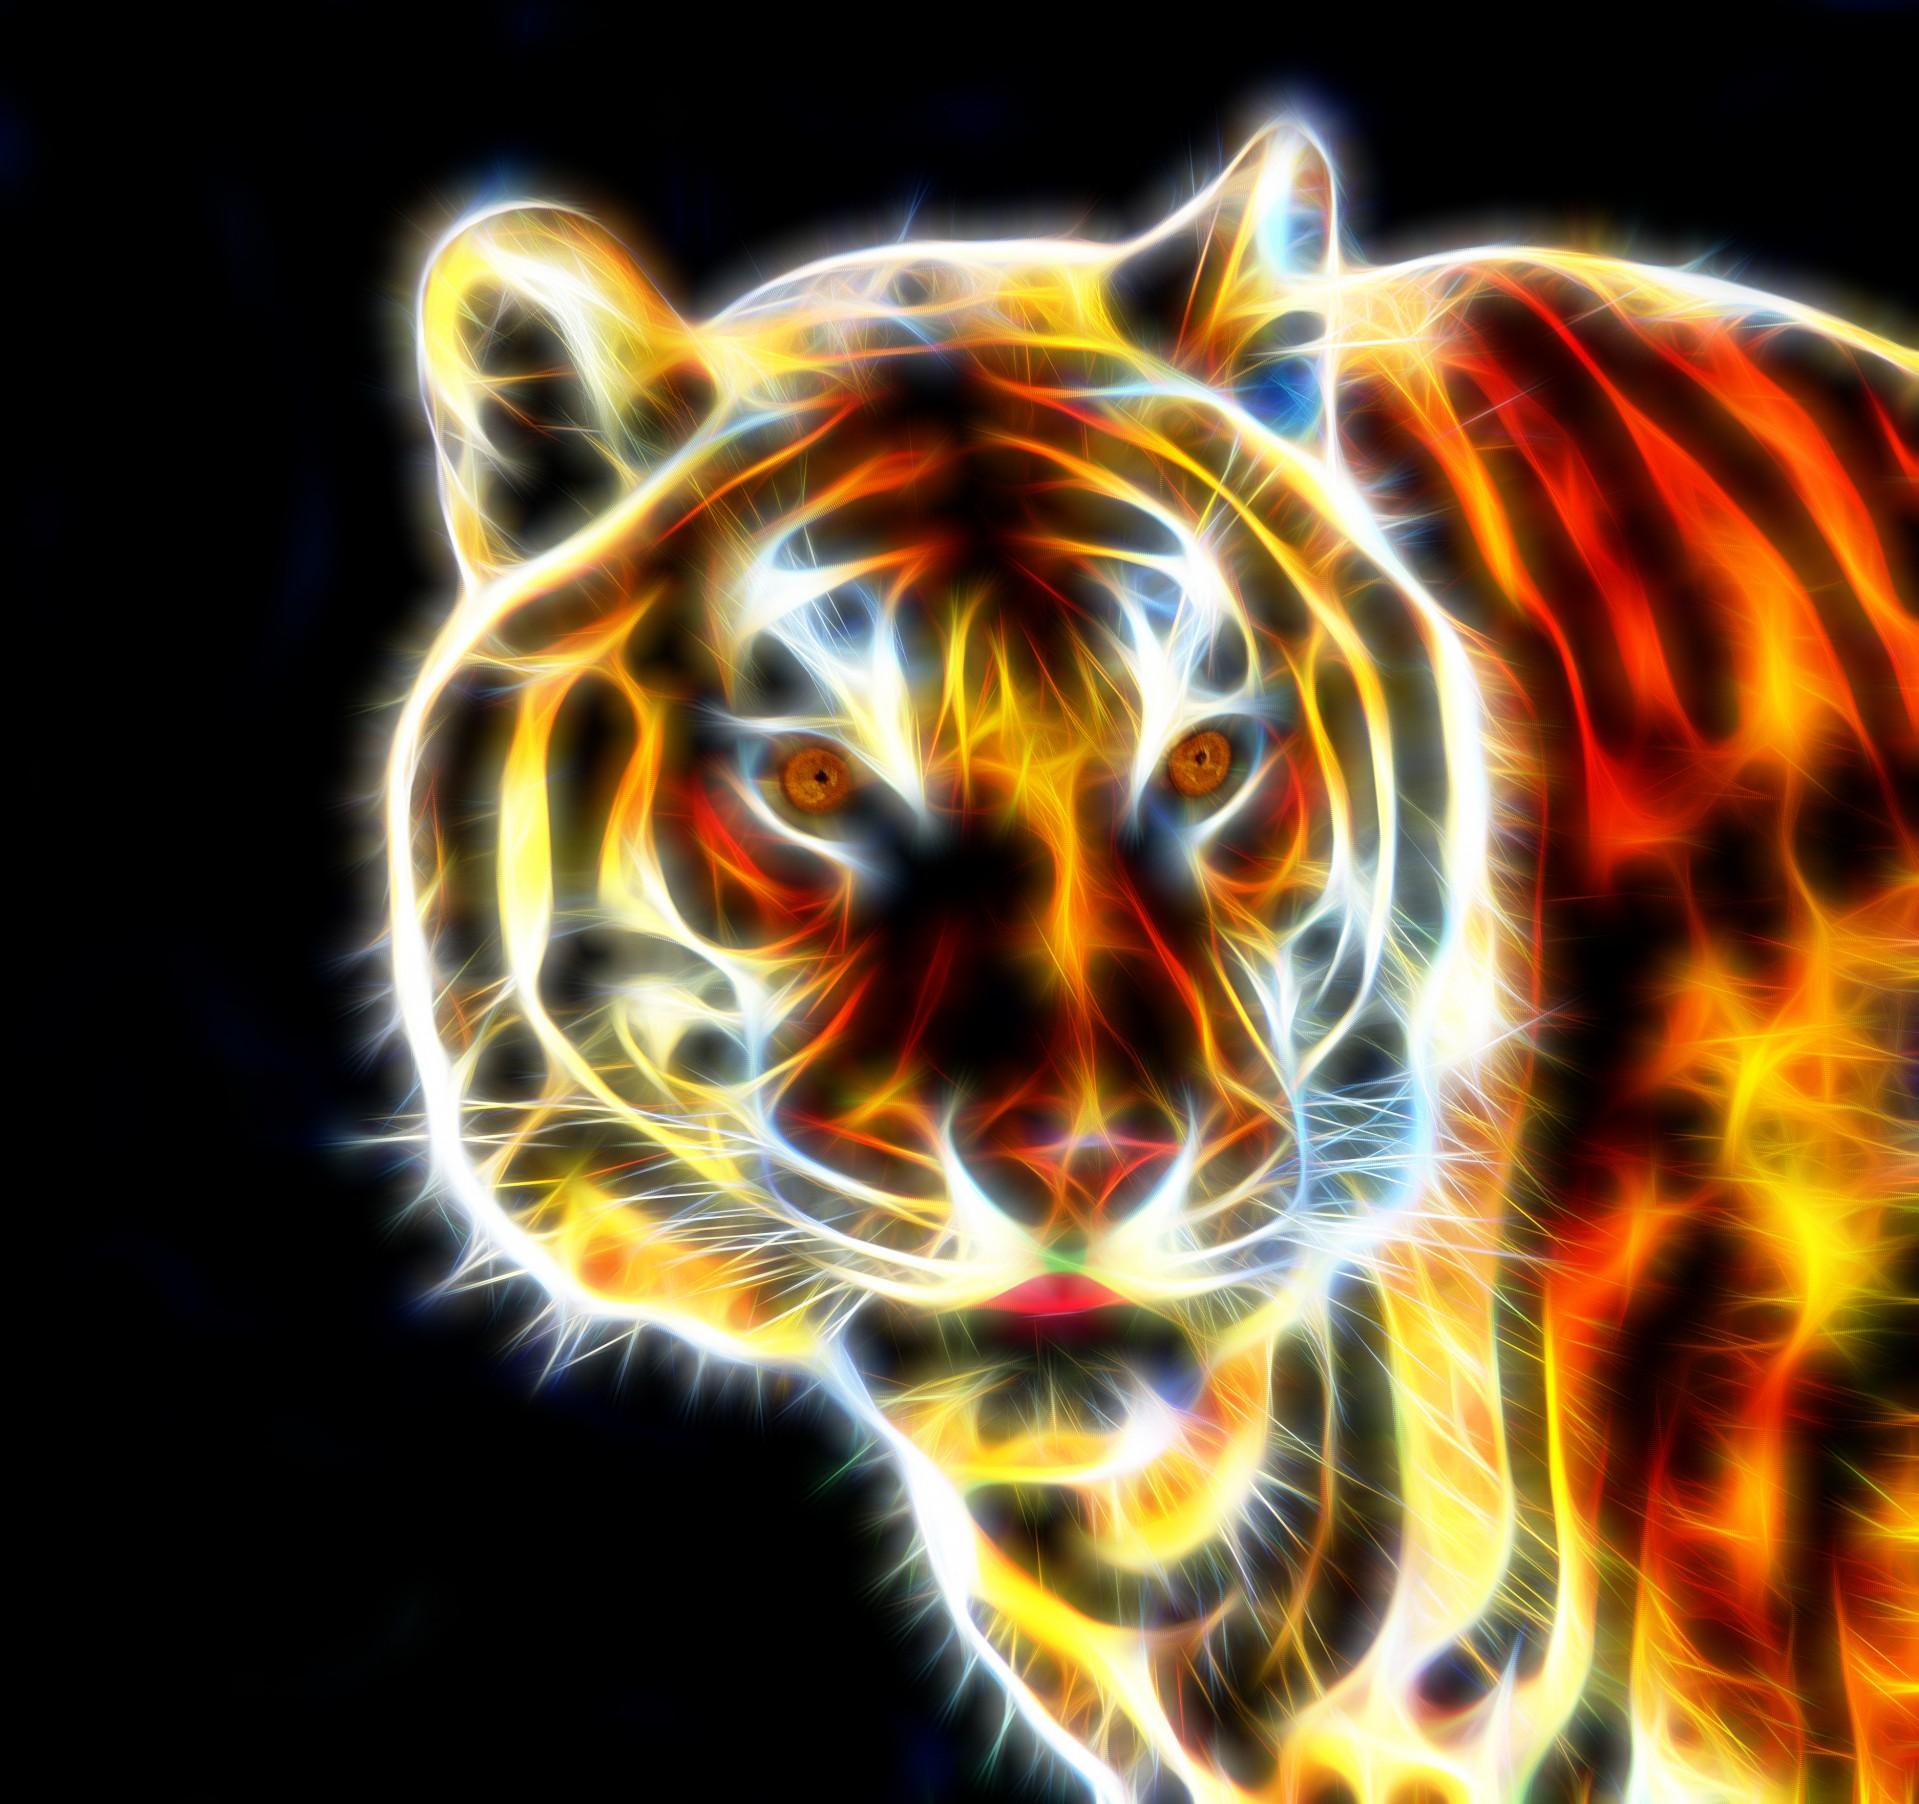 Cool neon tiger art